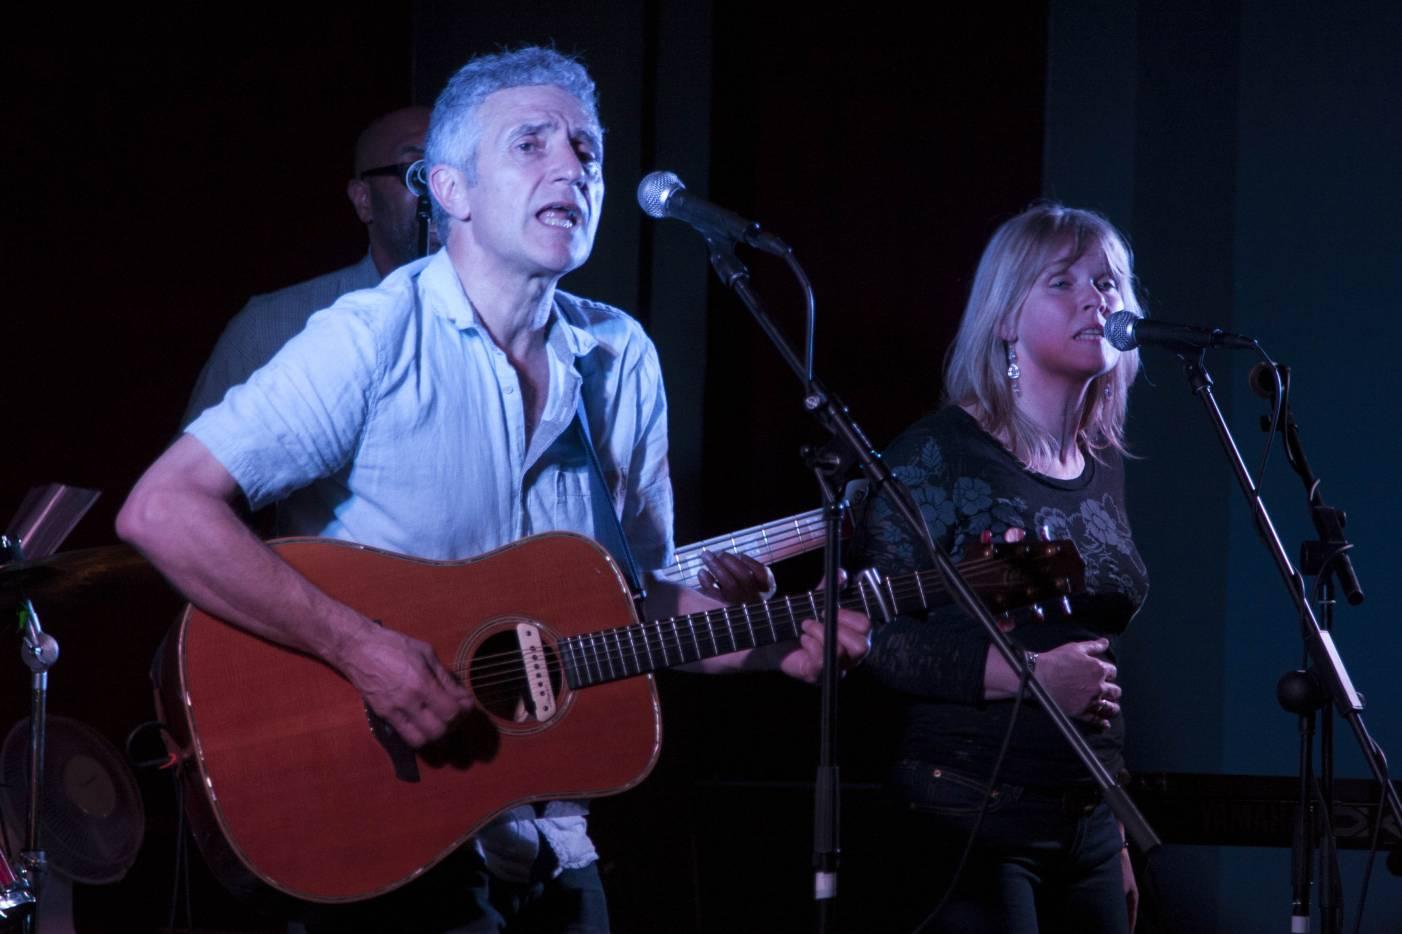 Latin Quarter Liverpool 2012: Steve Skaith & Yona Dunsford